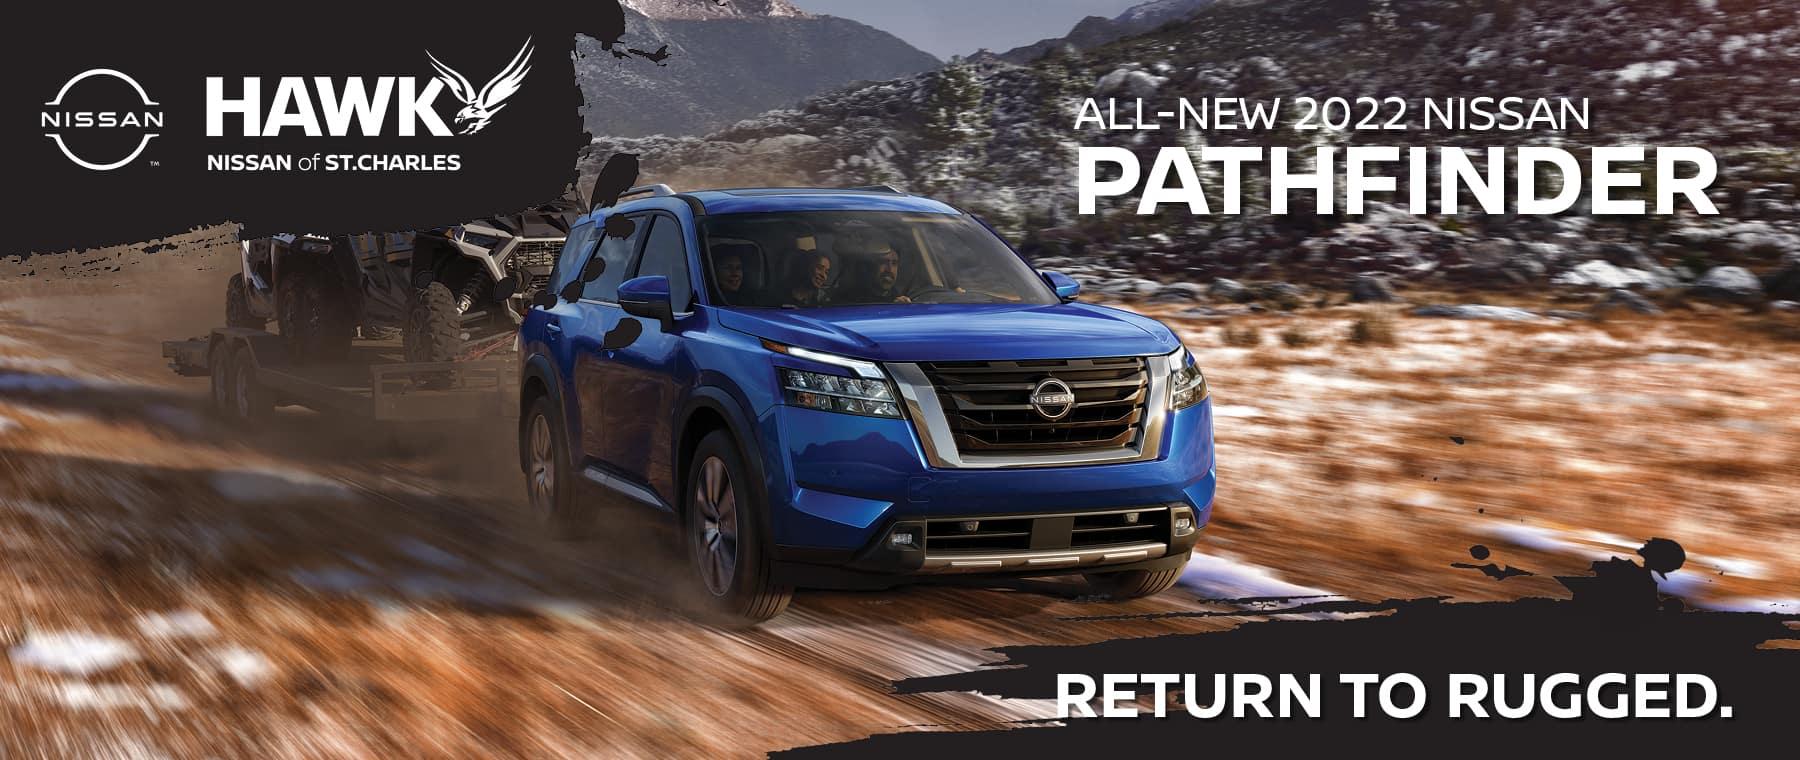 All New 2022 Nissan Pathfinder | Hawk Nissan of St. Charles